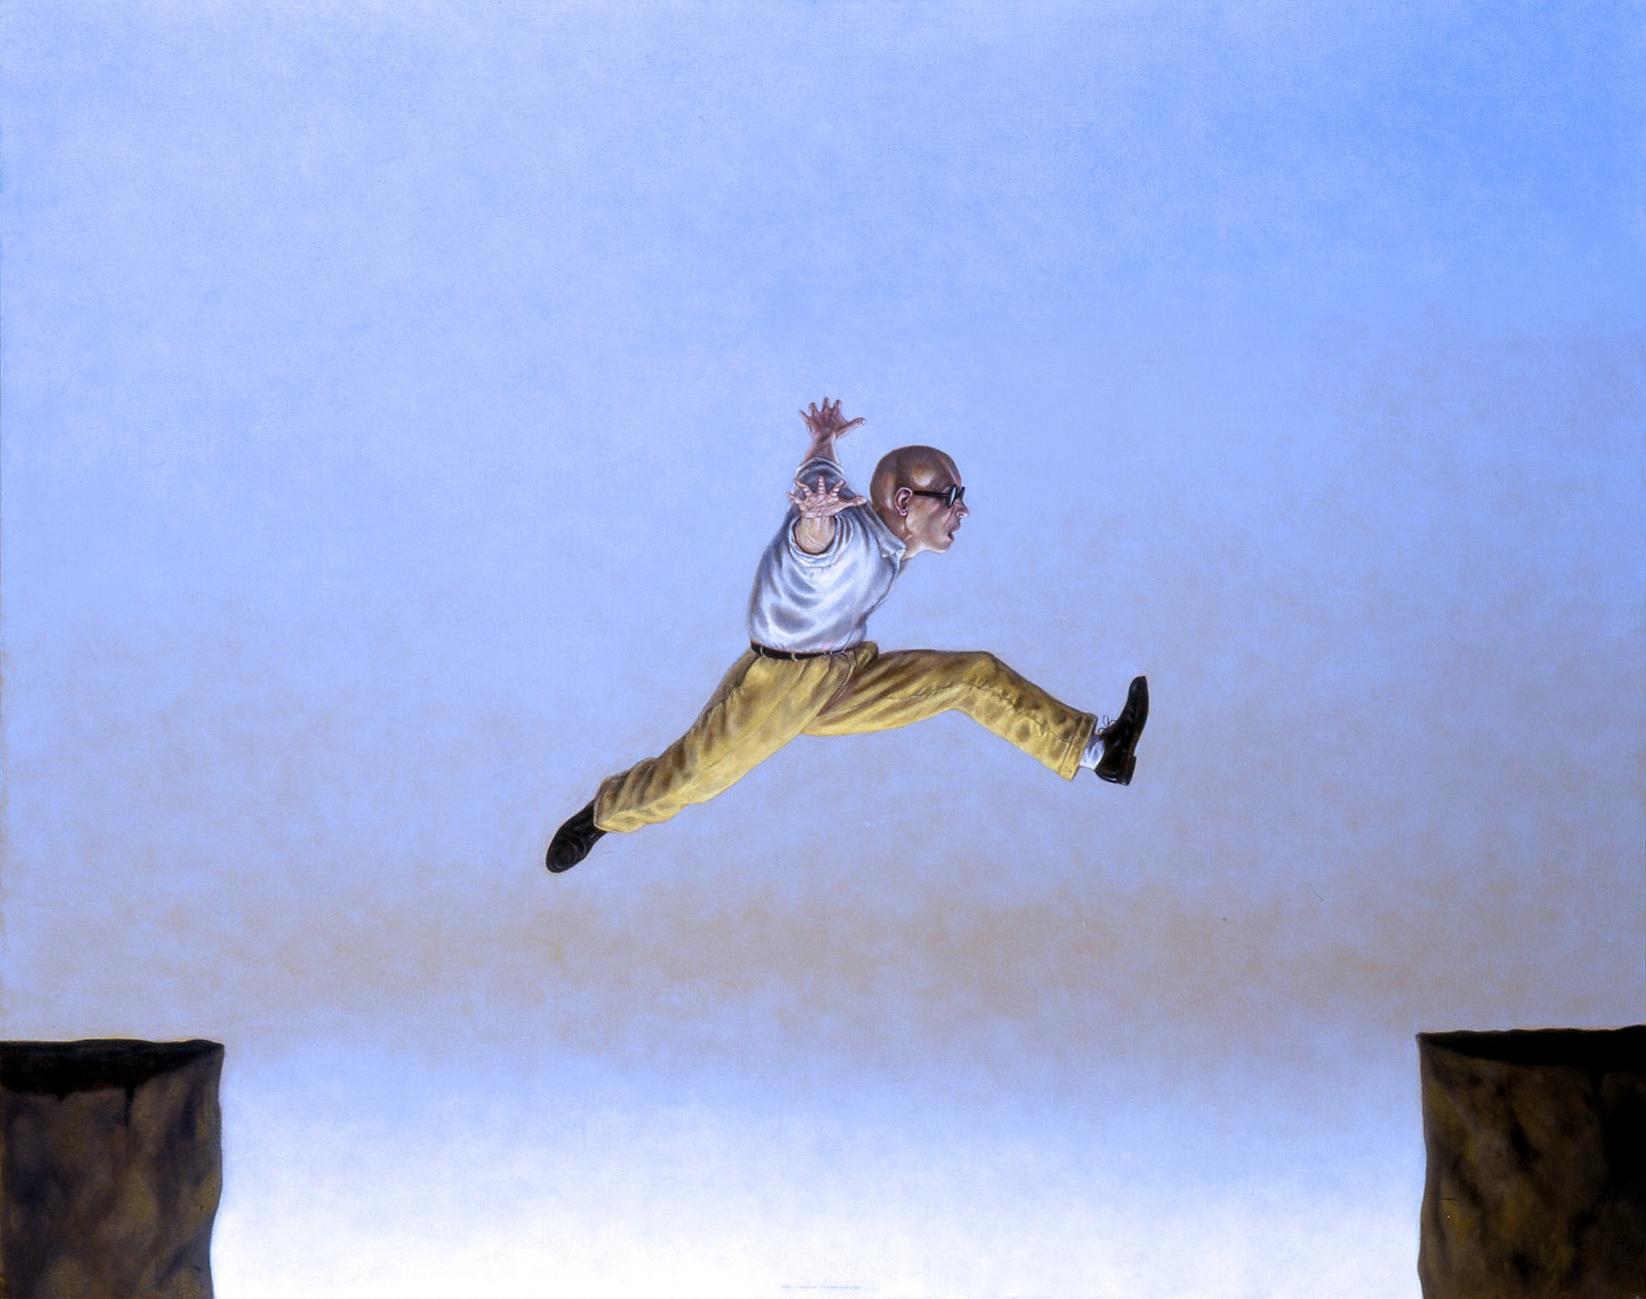 Welcome page: Jumping Man by David Dalla Venezia